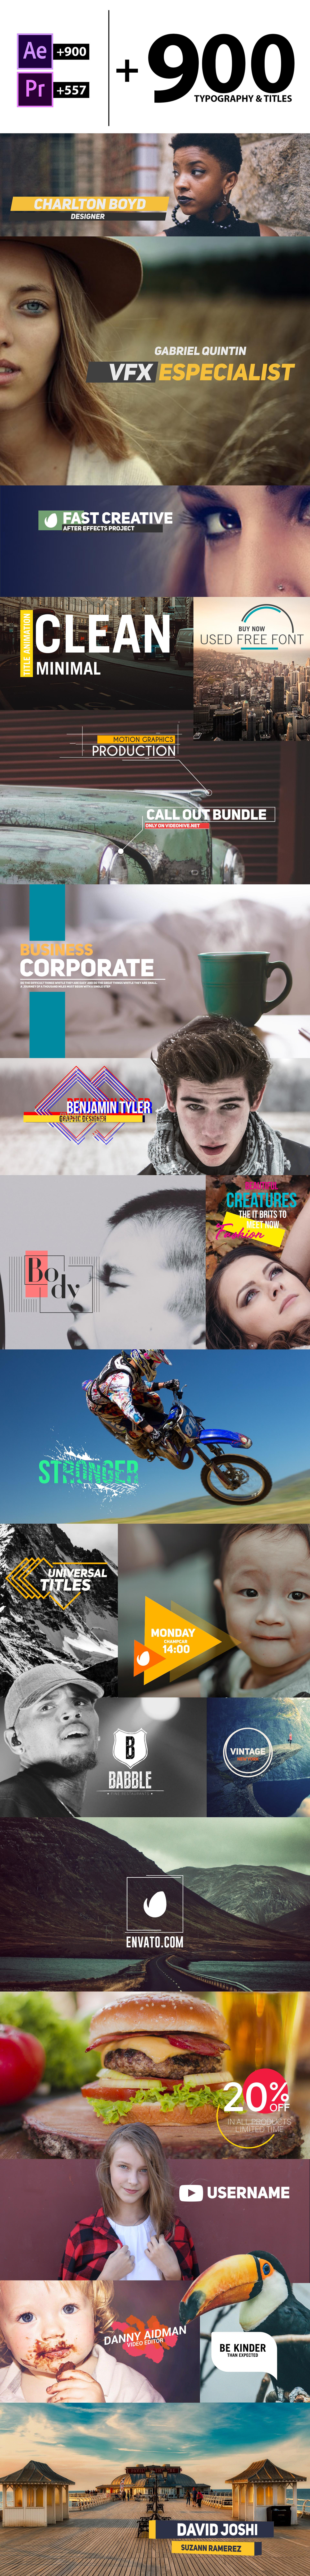 900 Typography & Titles - 8